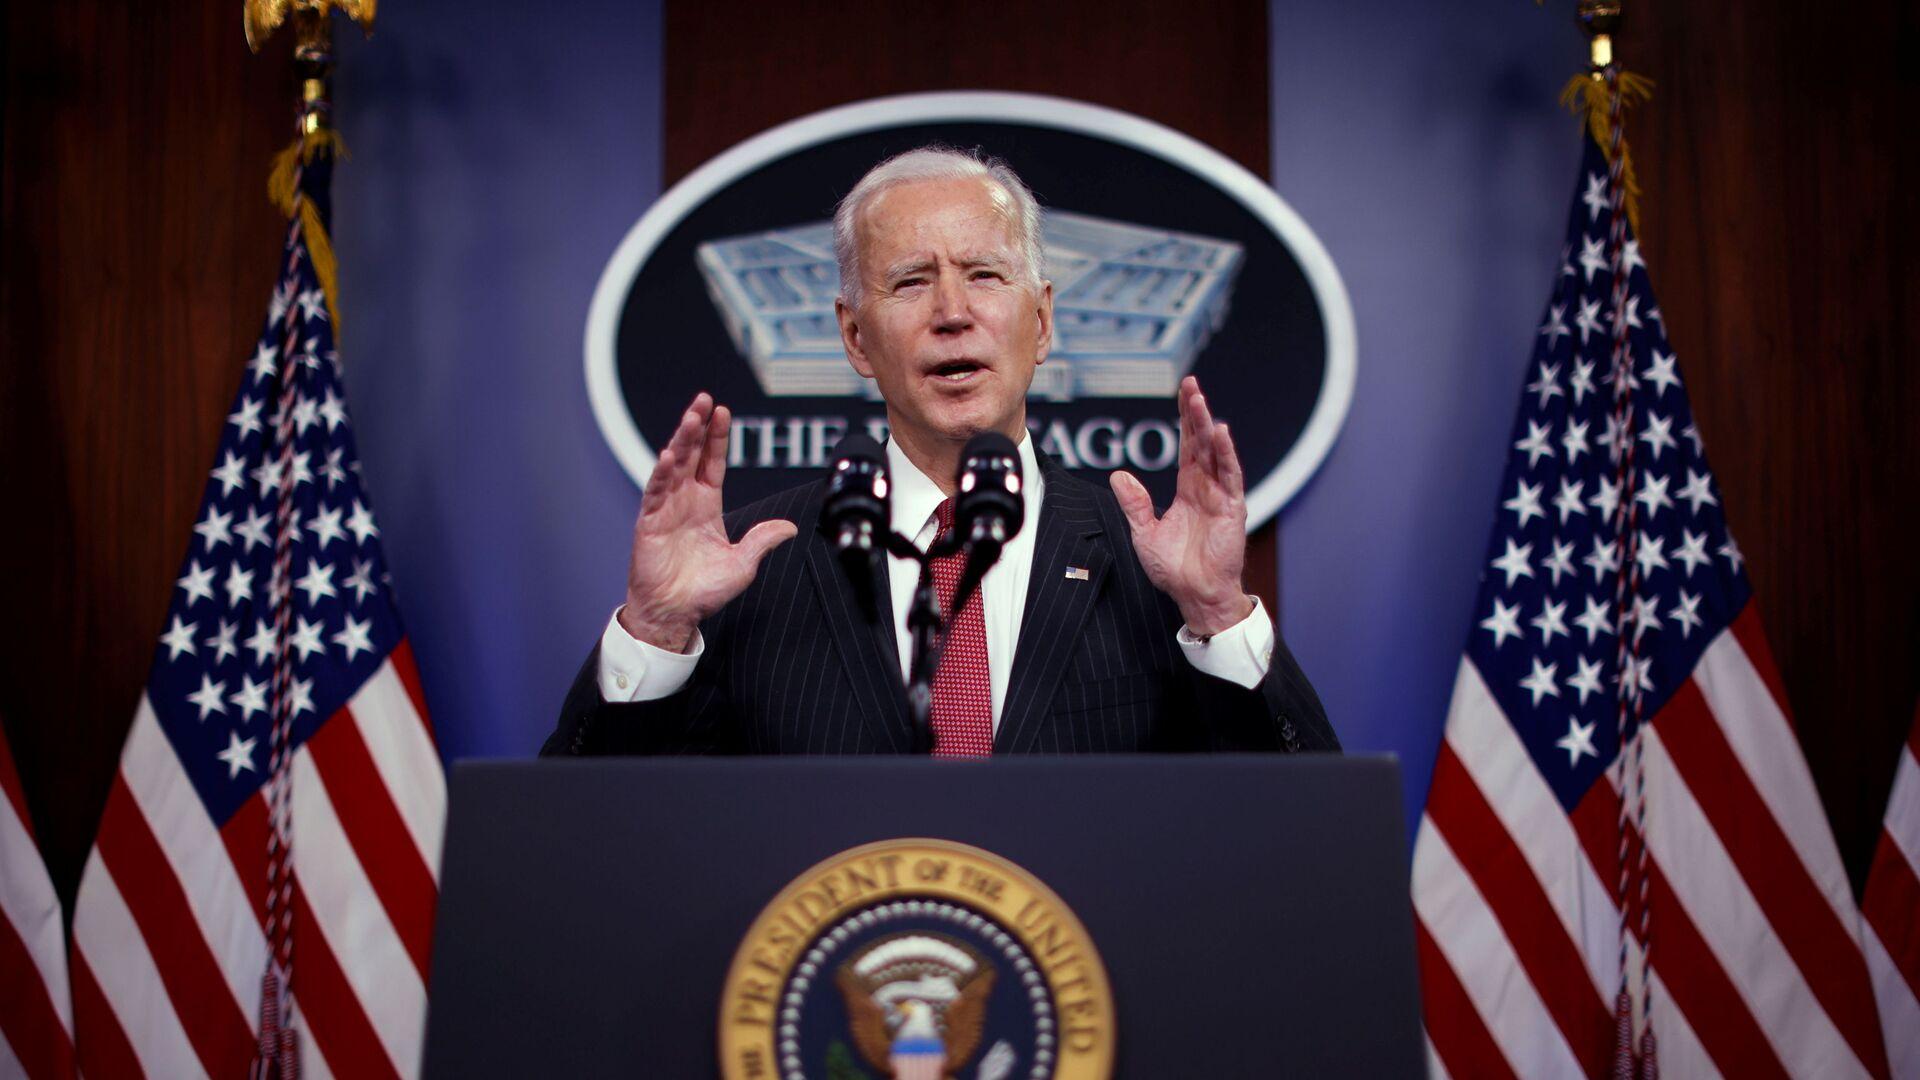 Joe Biden, presidente de EEUU - Sputnik Mundo, 1920, 08.03.2021